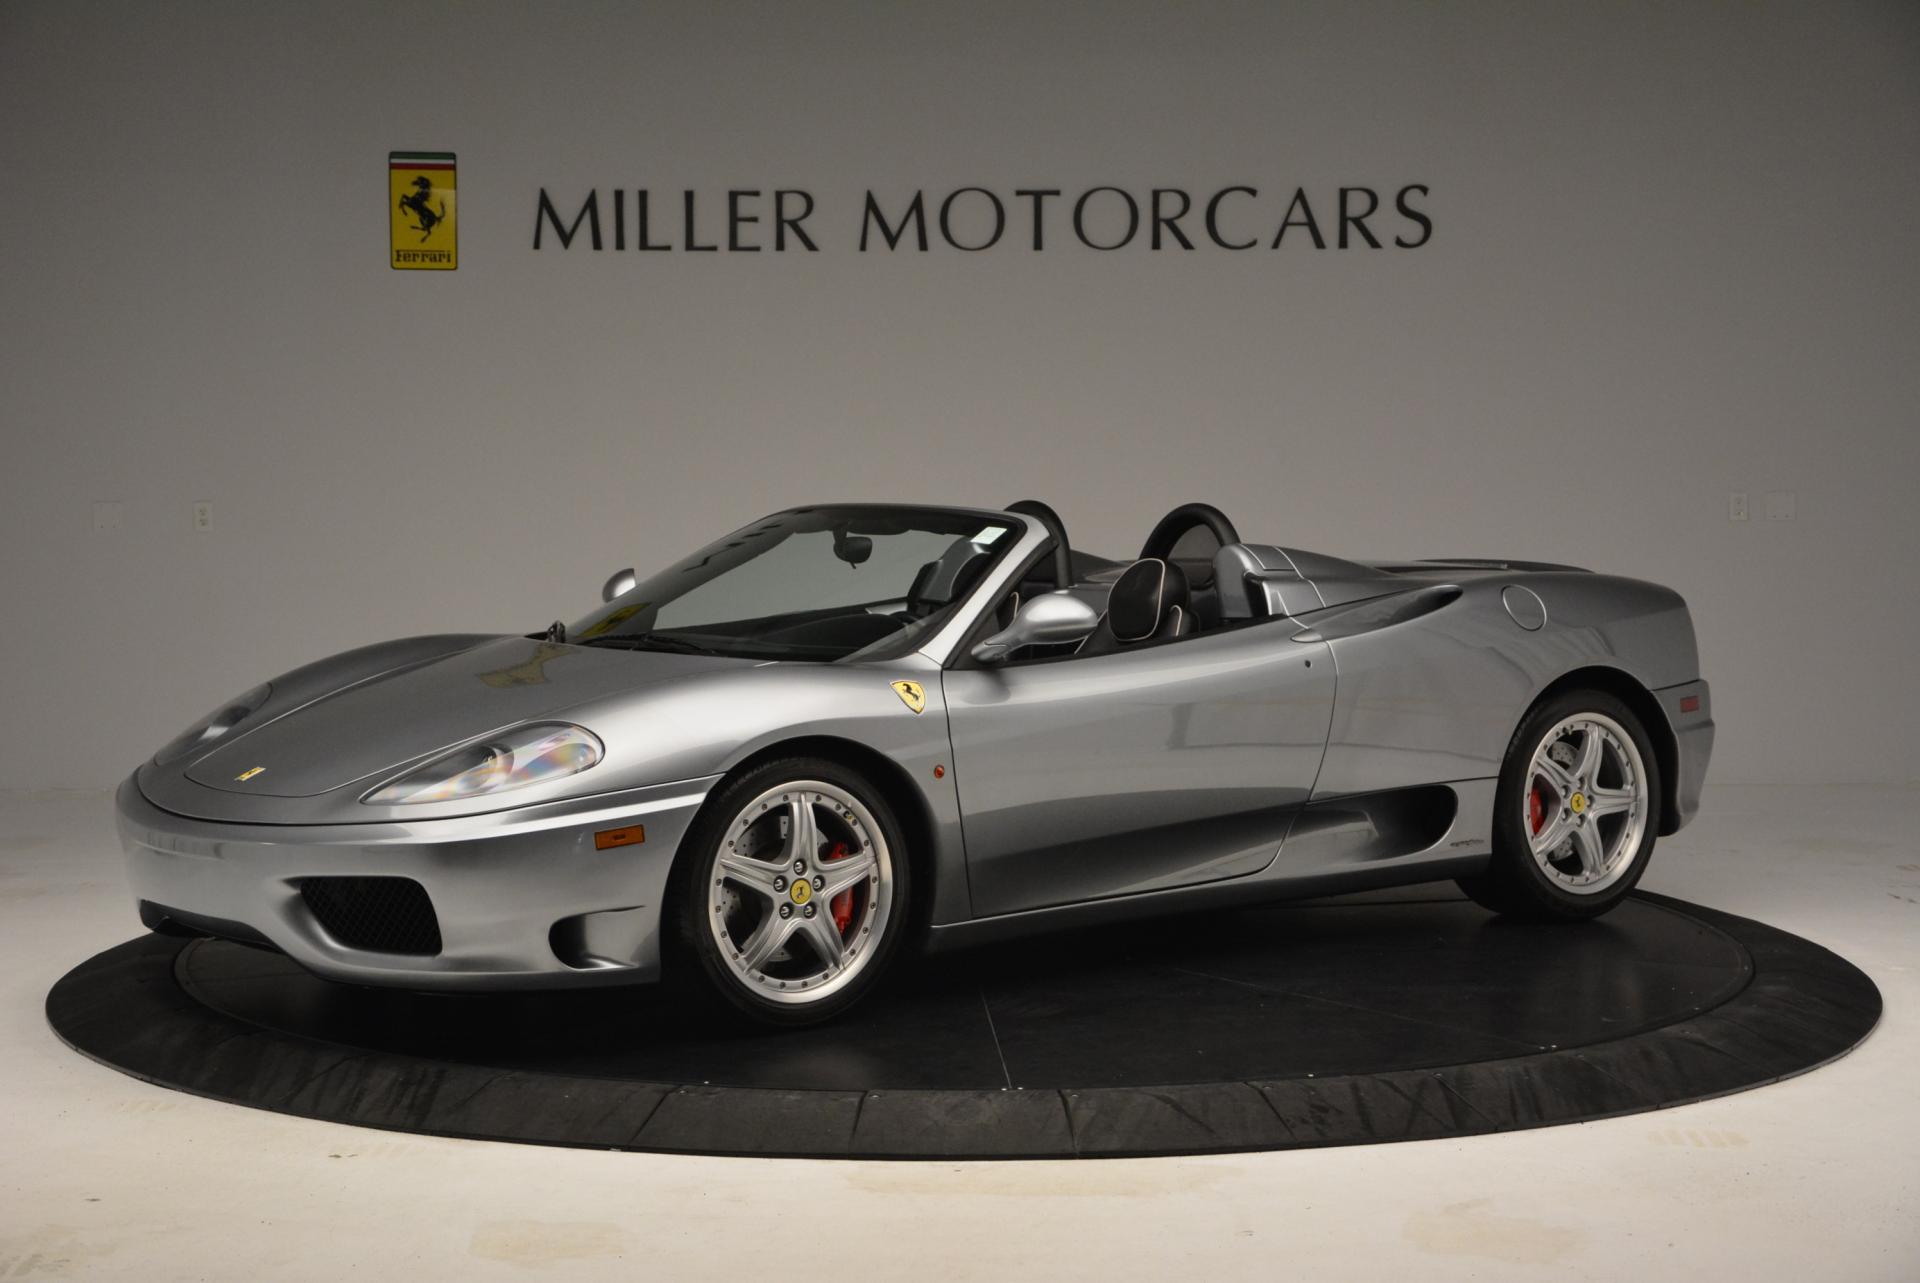 Used 2004 Ferrari 360 Spider 6-Speed Manual  For Sale In Westport, CT 138_p2